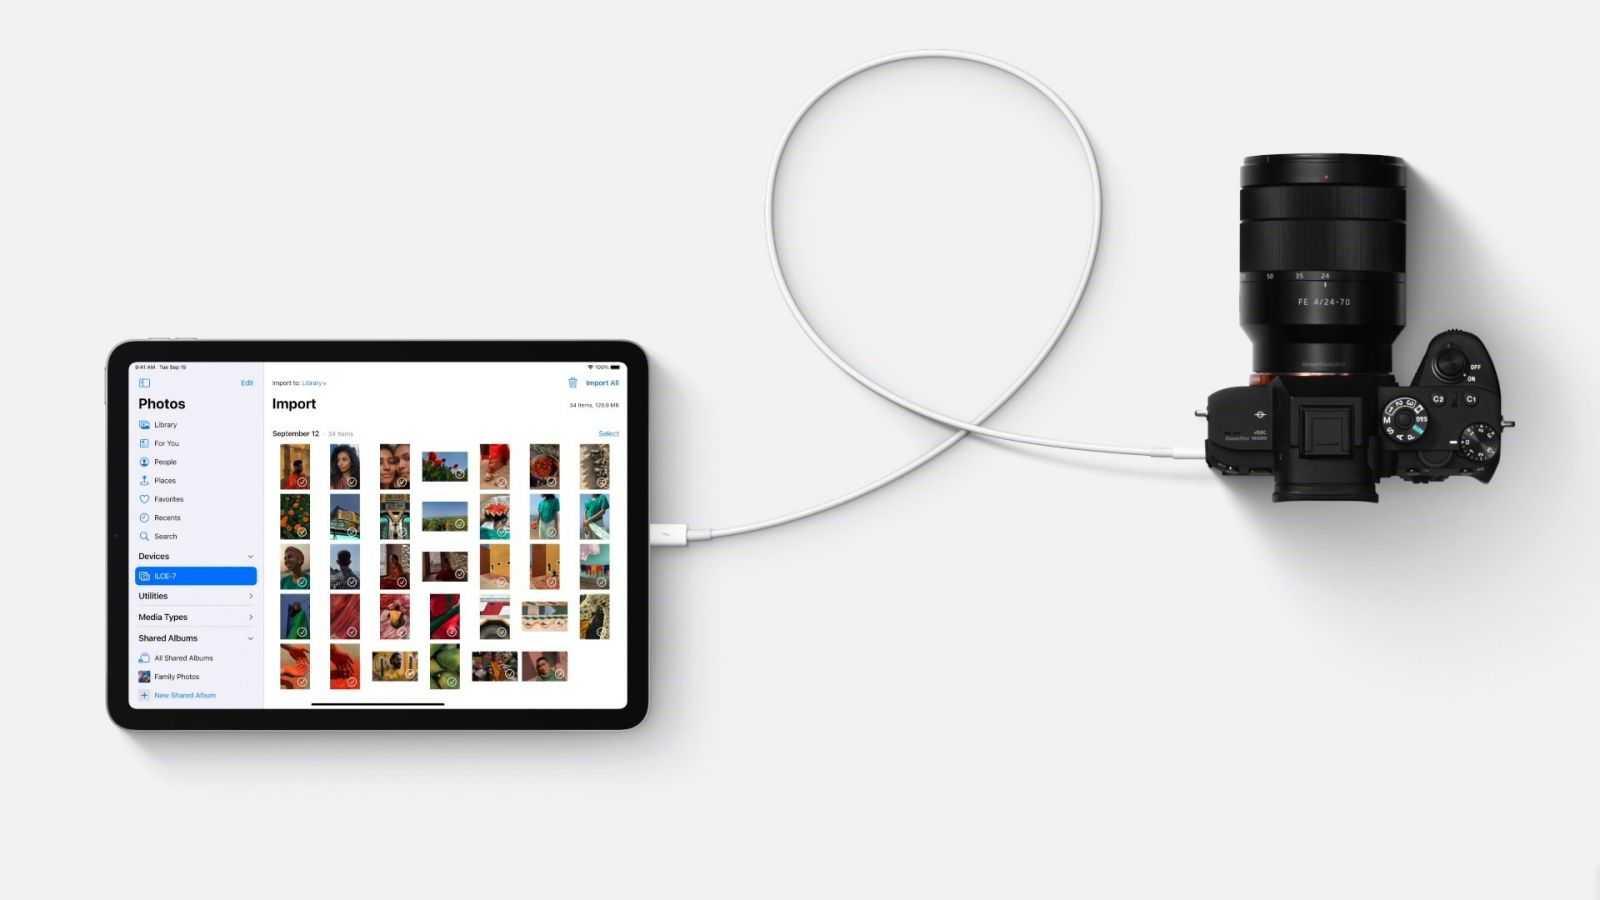 Apple показала новый мощный iPad Air 2020 (lcimg edcd9252 a2f1 4641 9569 79c86949cf83)